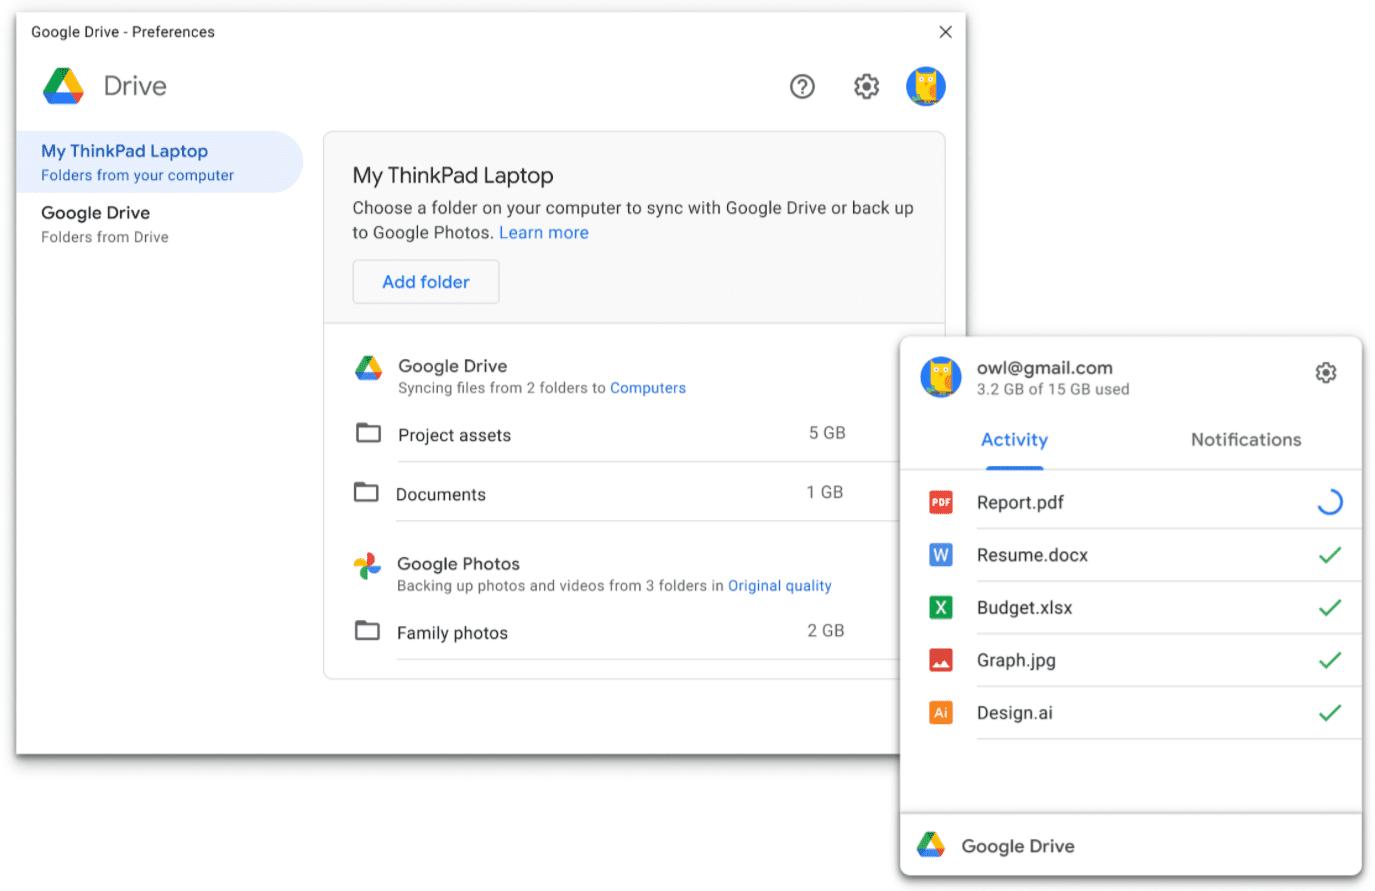 Google Drive for Desktop app